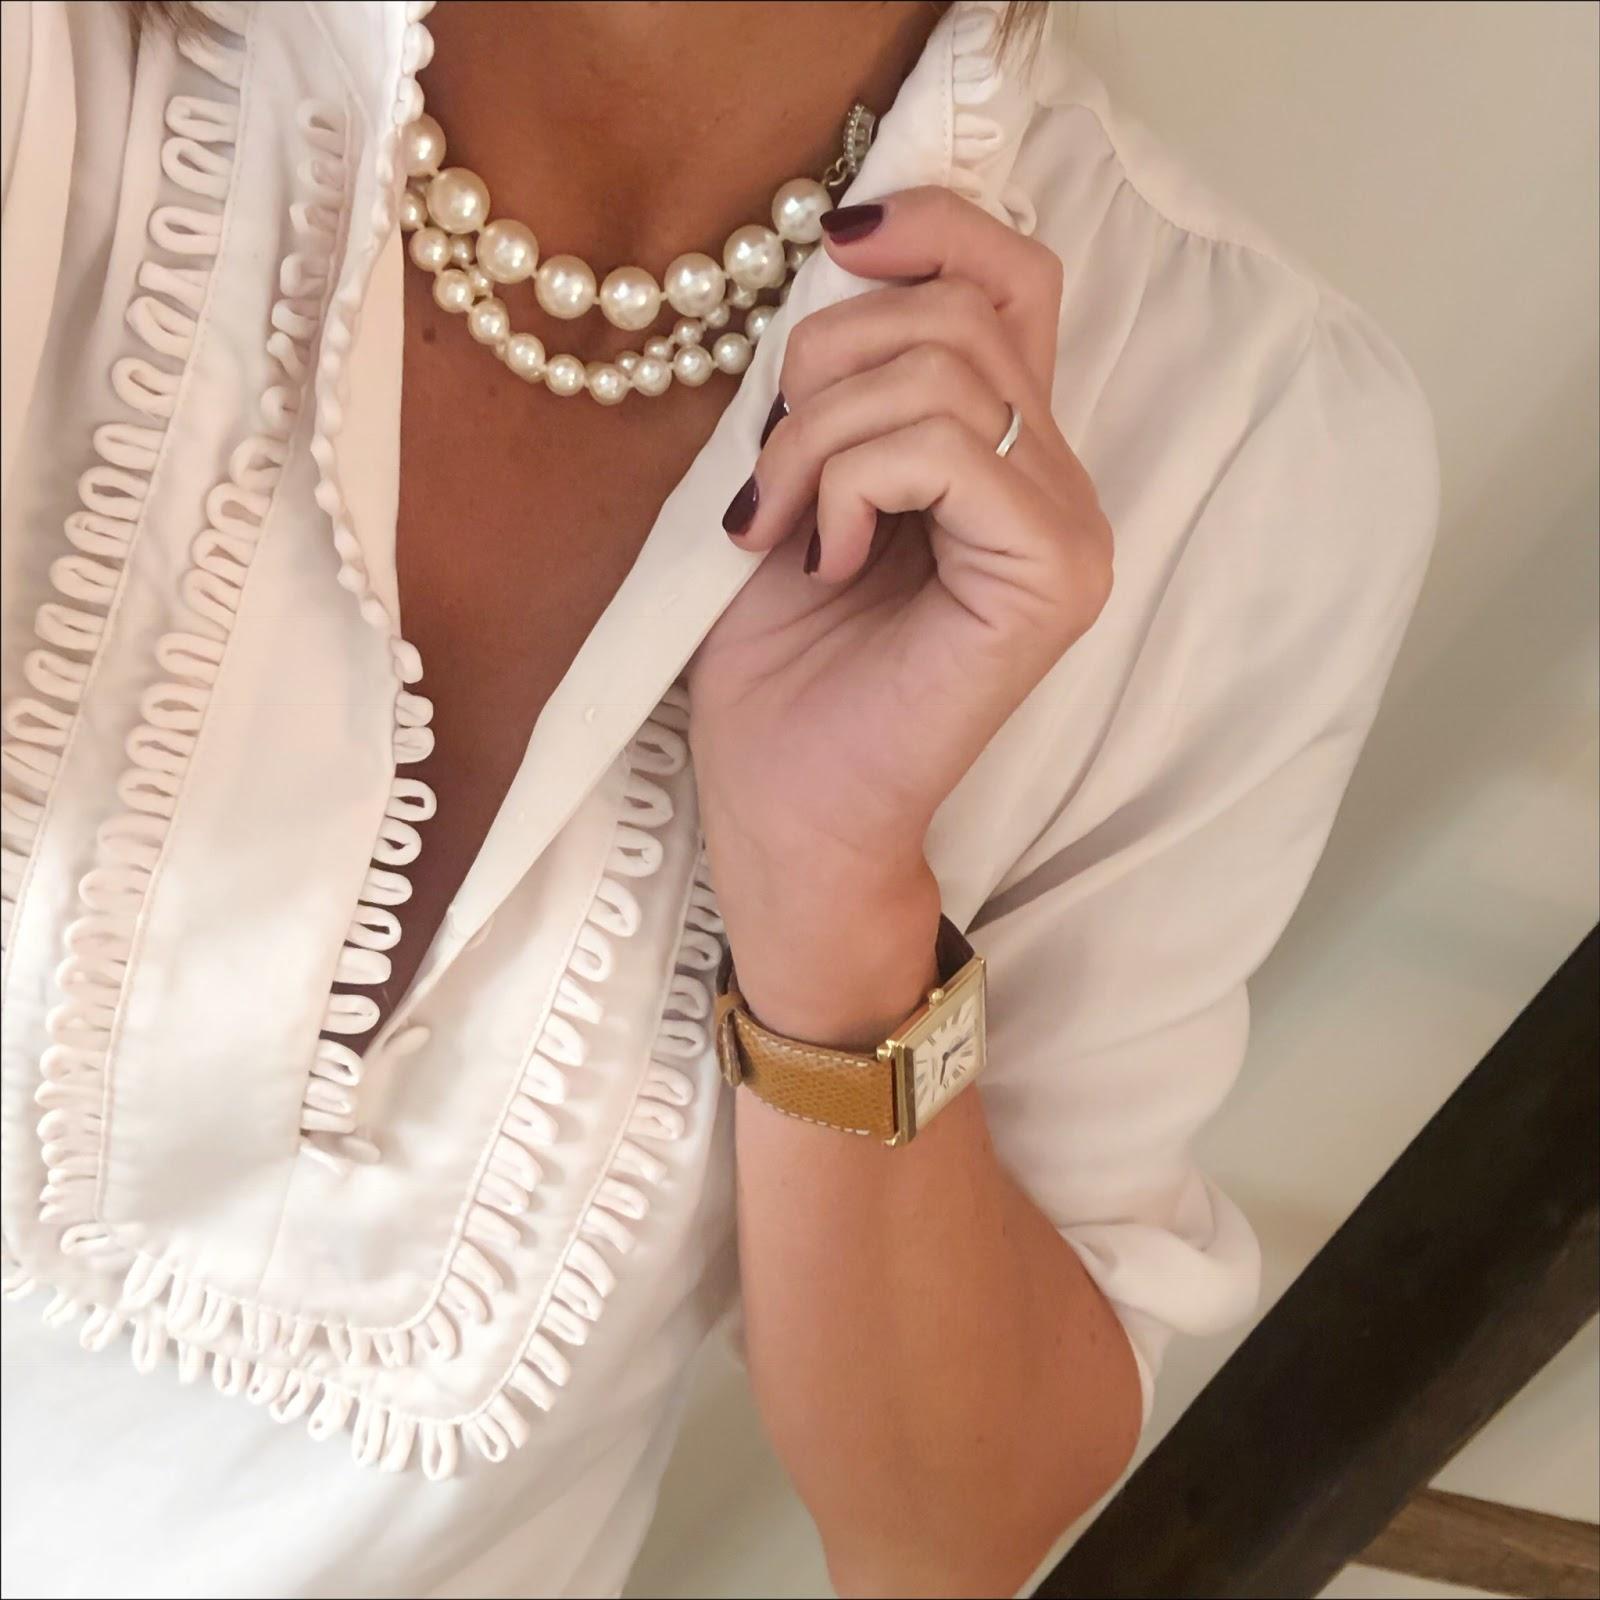 my midlife fashion, pearls, monsoon frill bib blouse, donna ida rixo skinny jeans, french sole henriette glitter ballet pumps